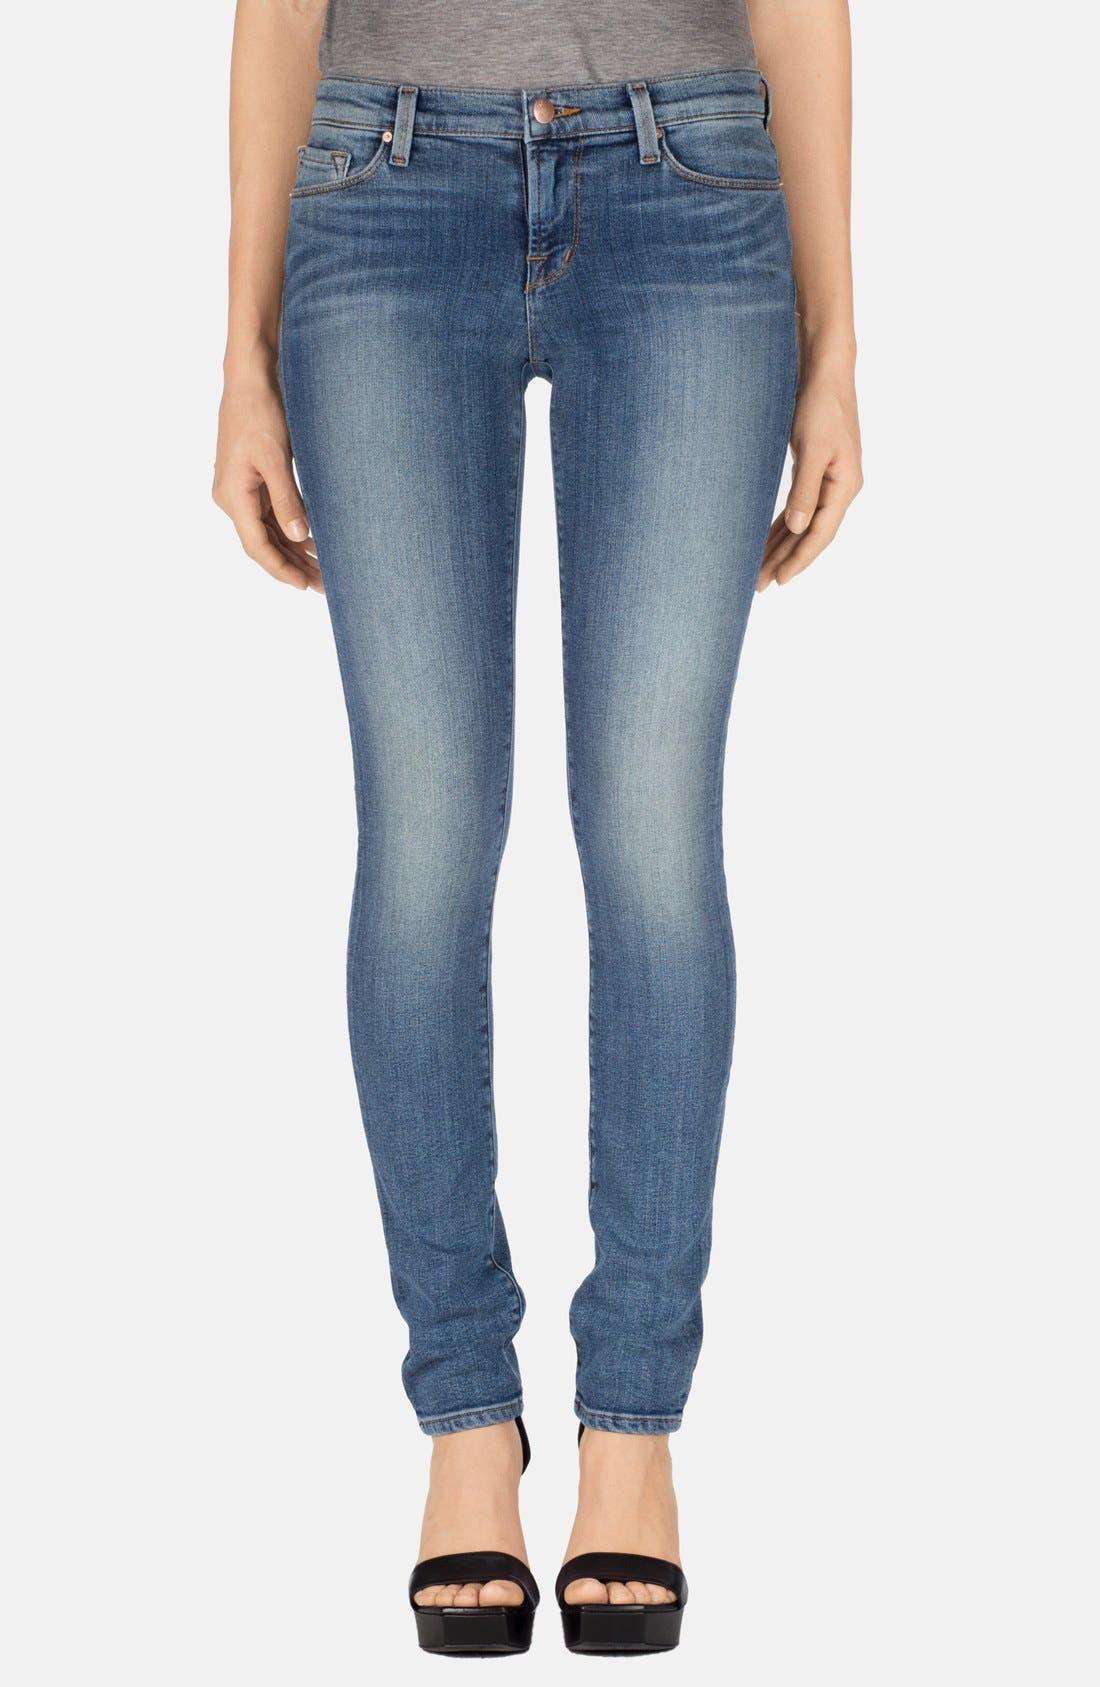 Main Image - J Brand 'Rail' Mid Rise Straight Leg Jeans (Tone)